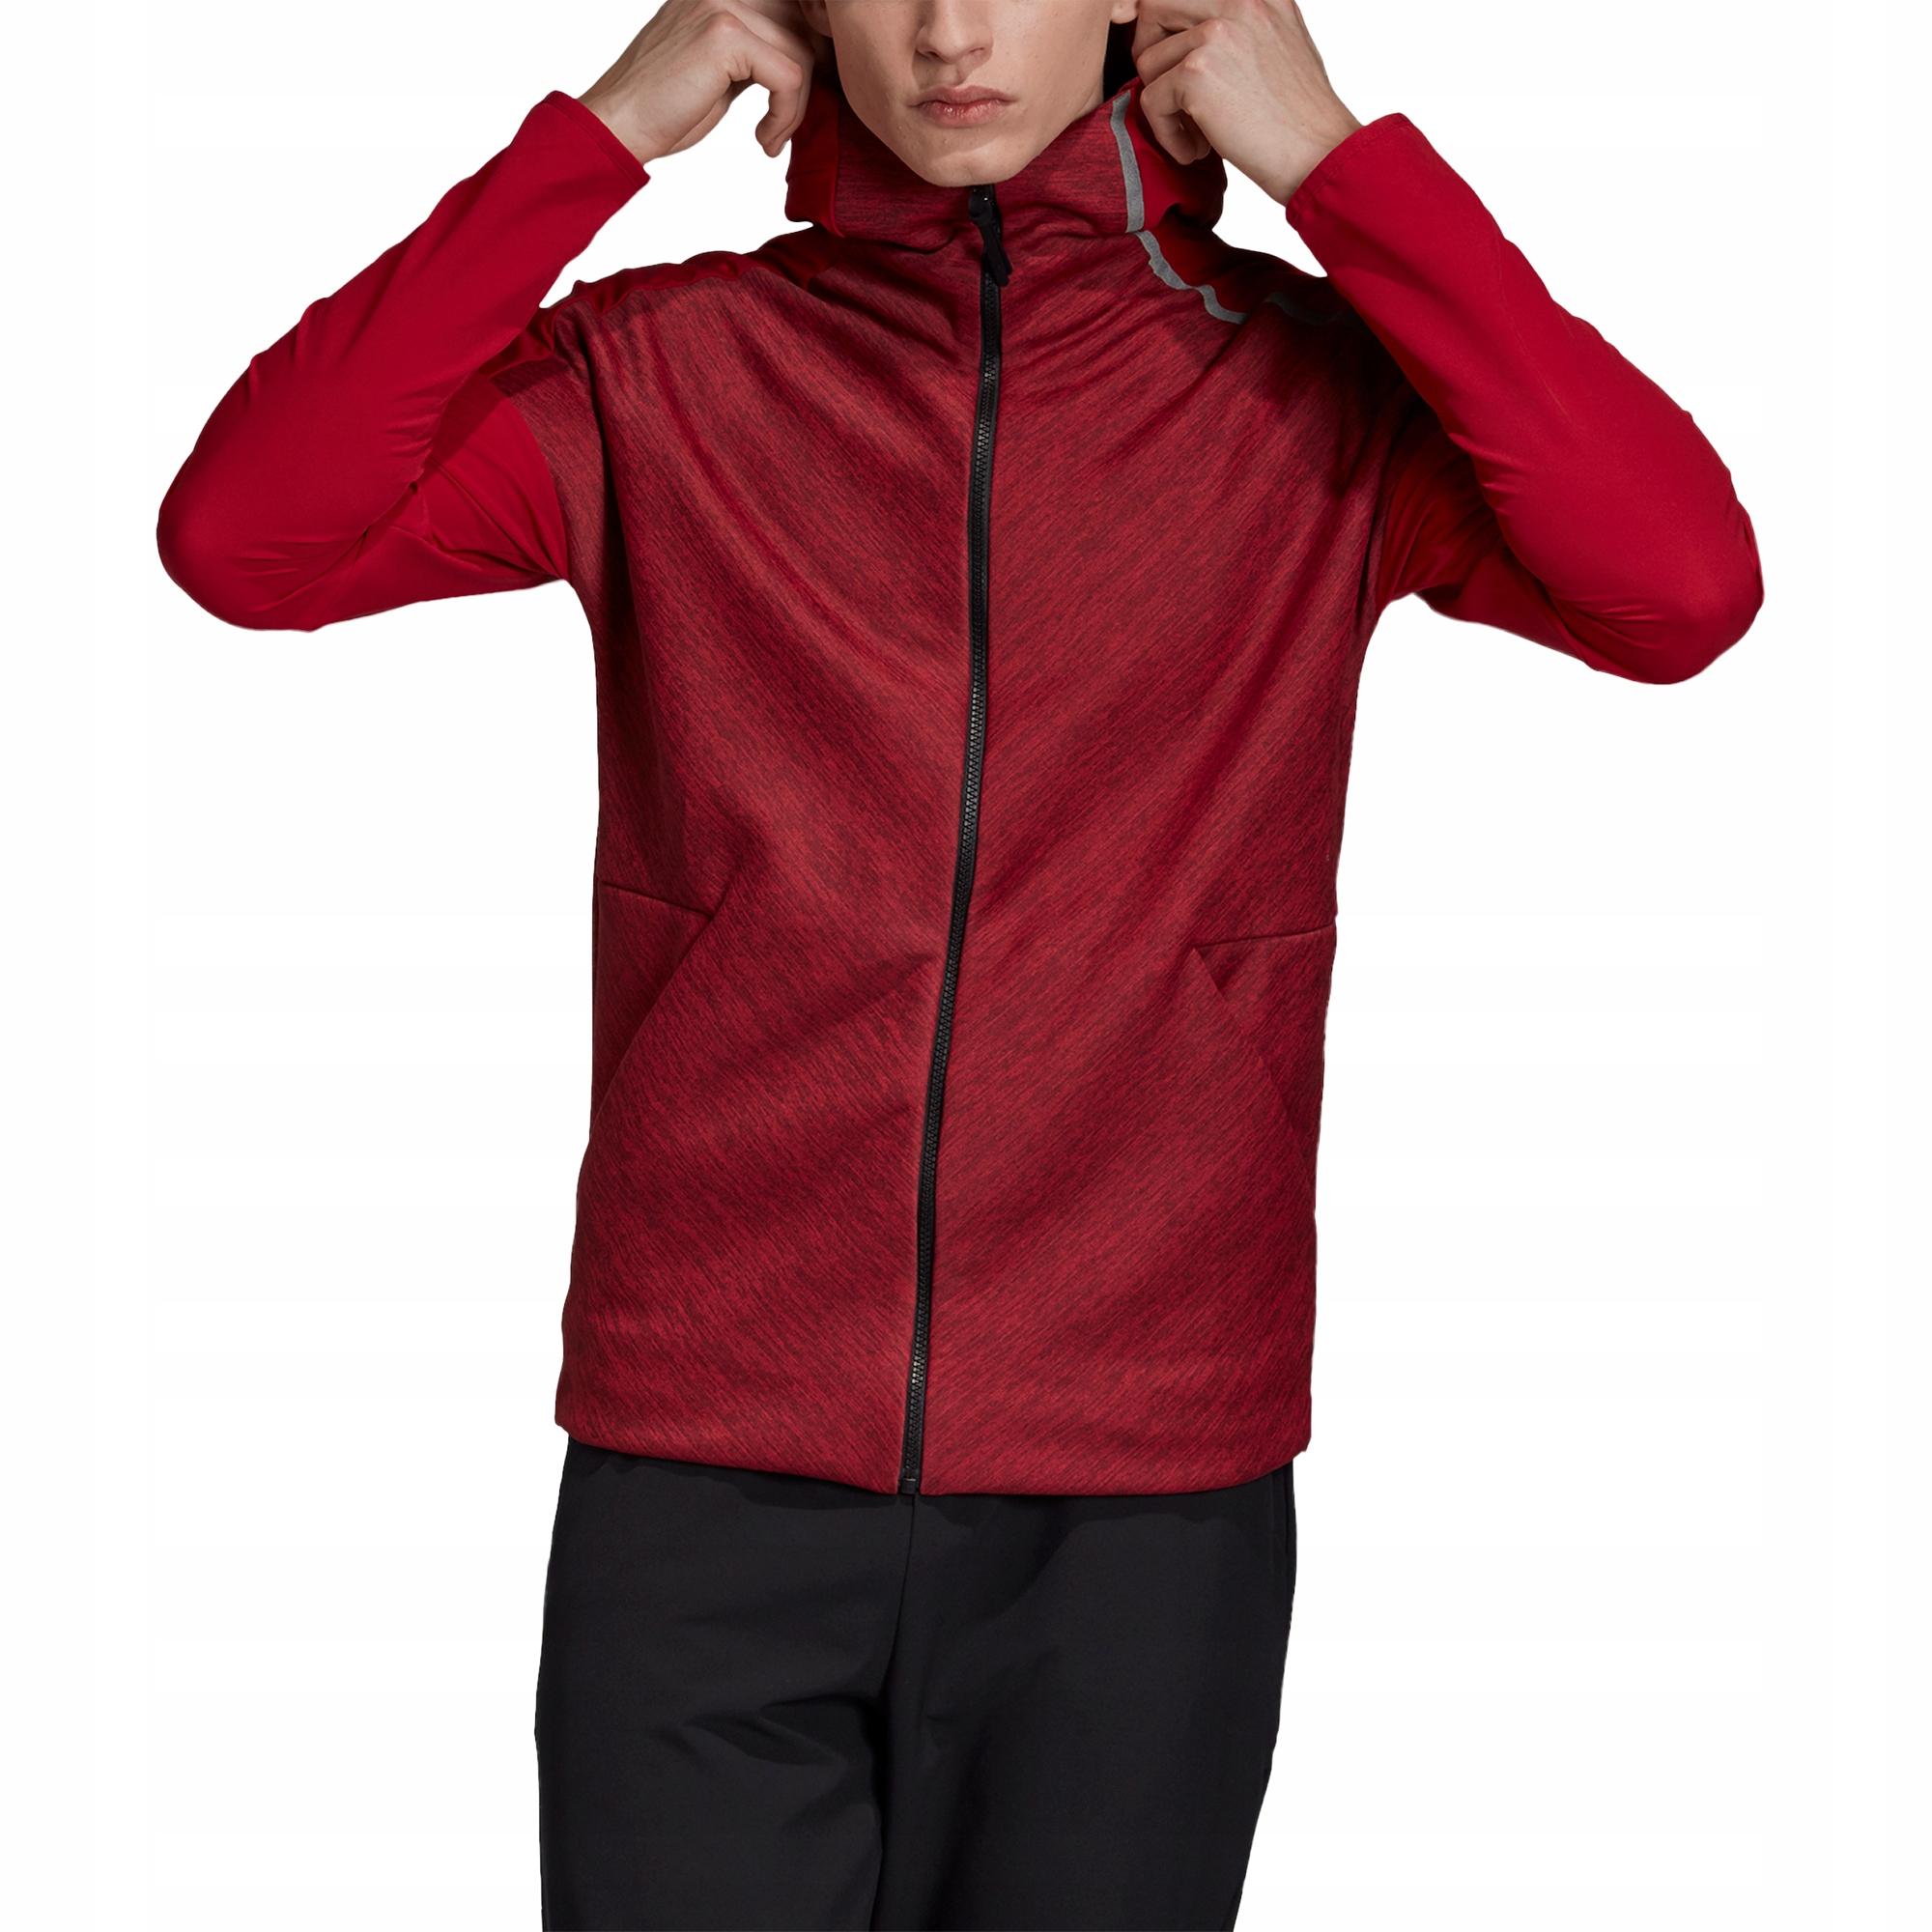 Bluza adidas Z.N.E. Fast Release Hybrid EI6189 M